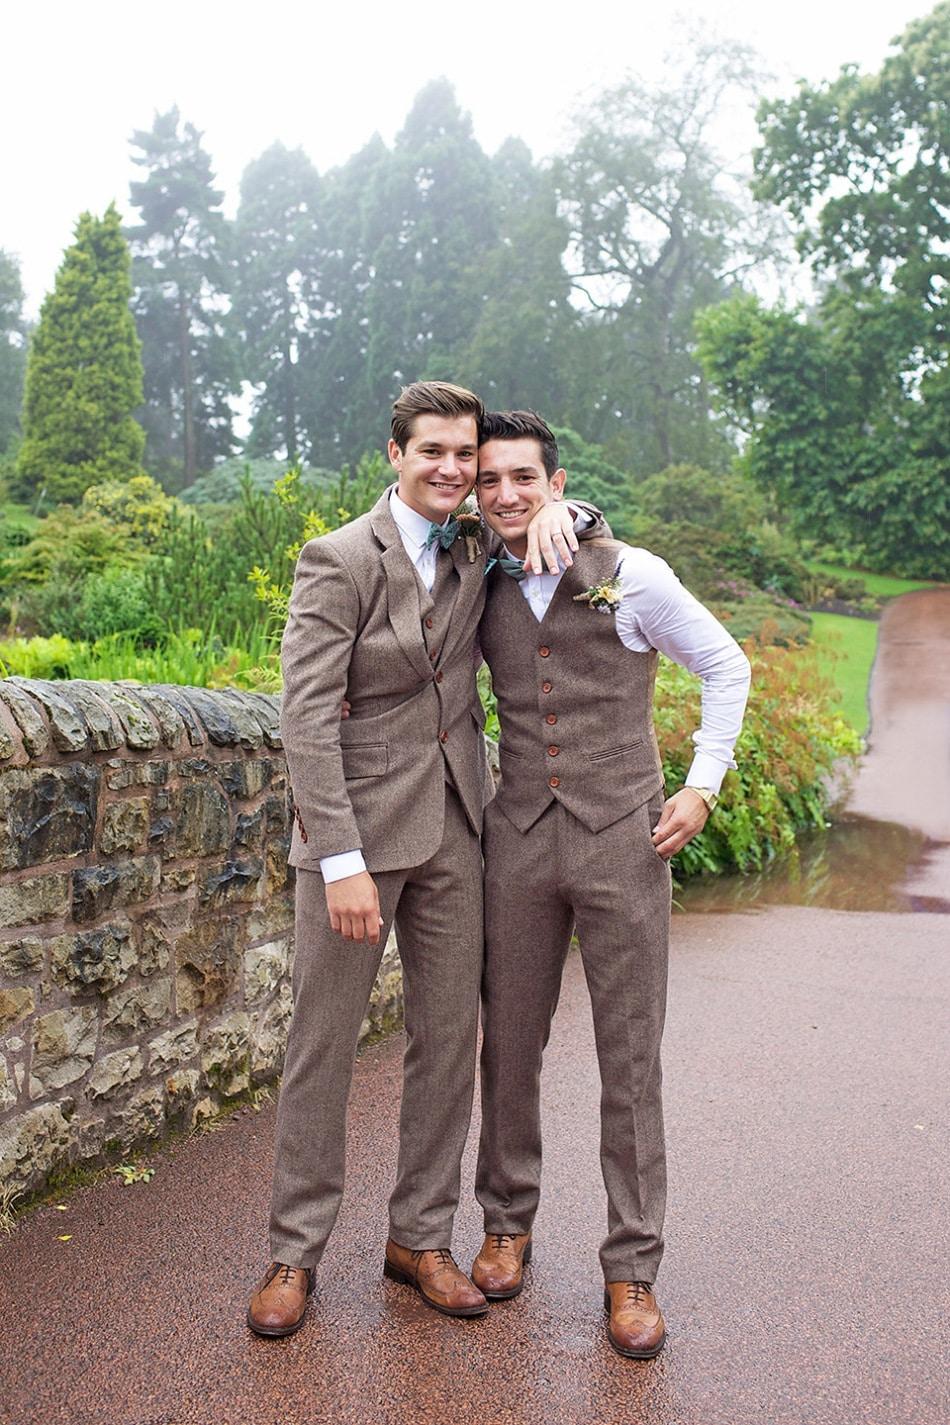 wpid324683-benjamin-roberts-dress-royal-botanic-gardens-edinburgh-39